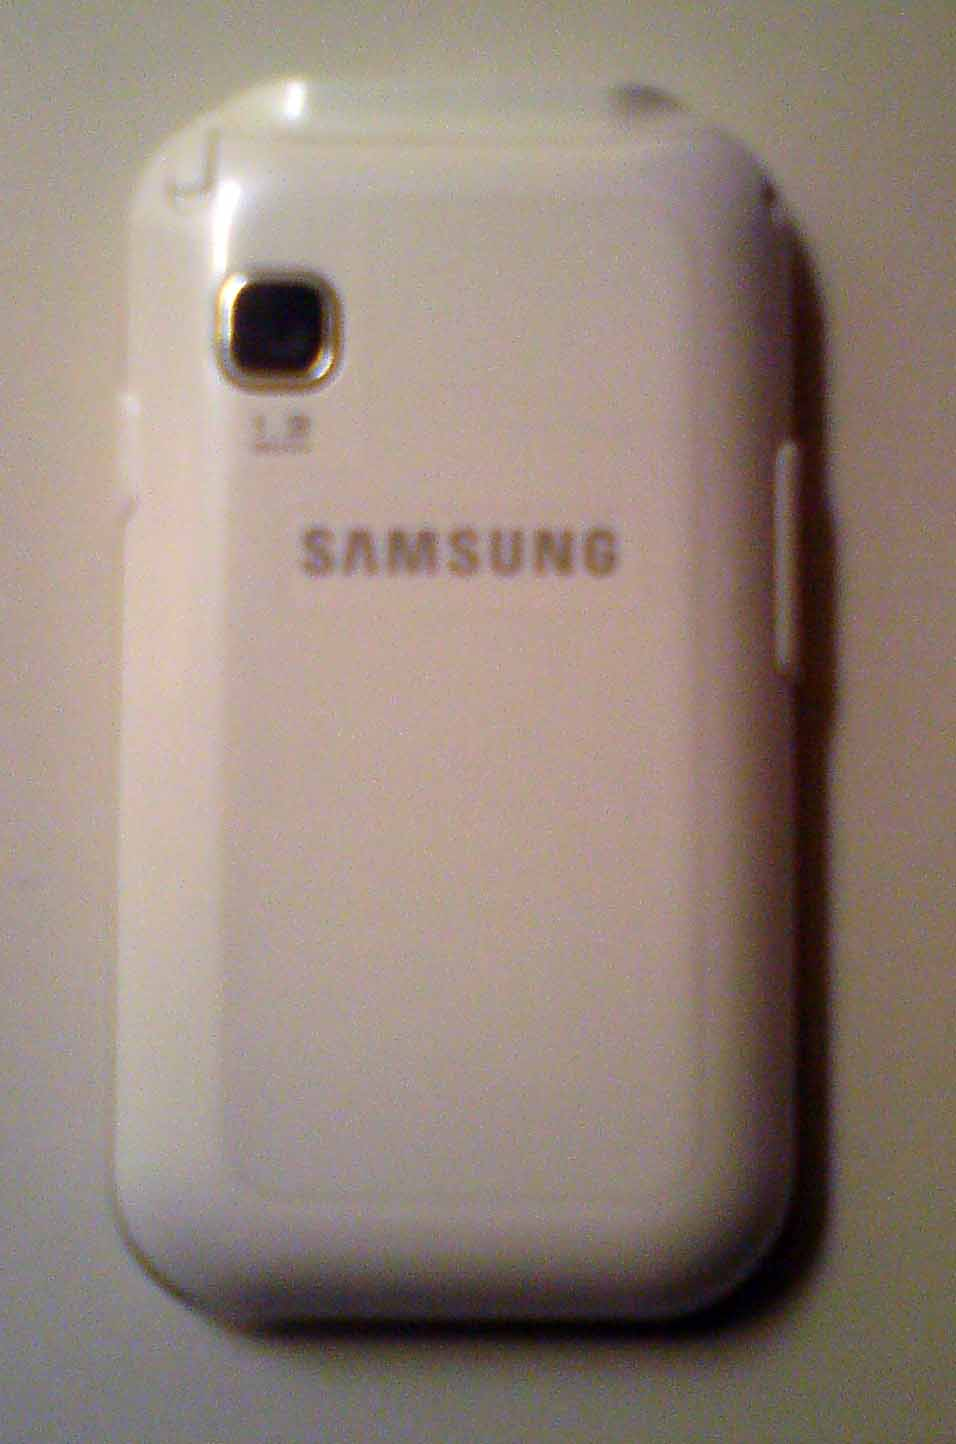 My Samsung GT-C330K (aka Samsung Champ)